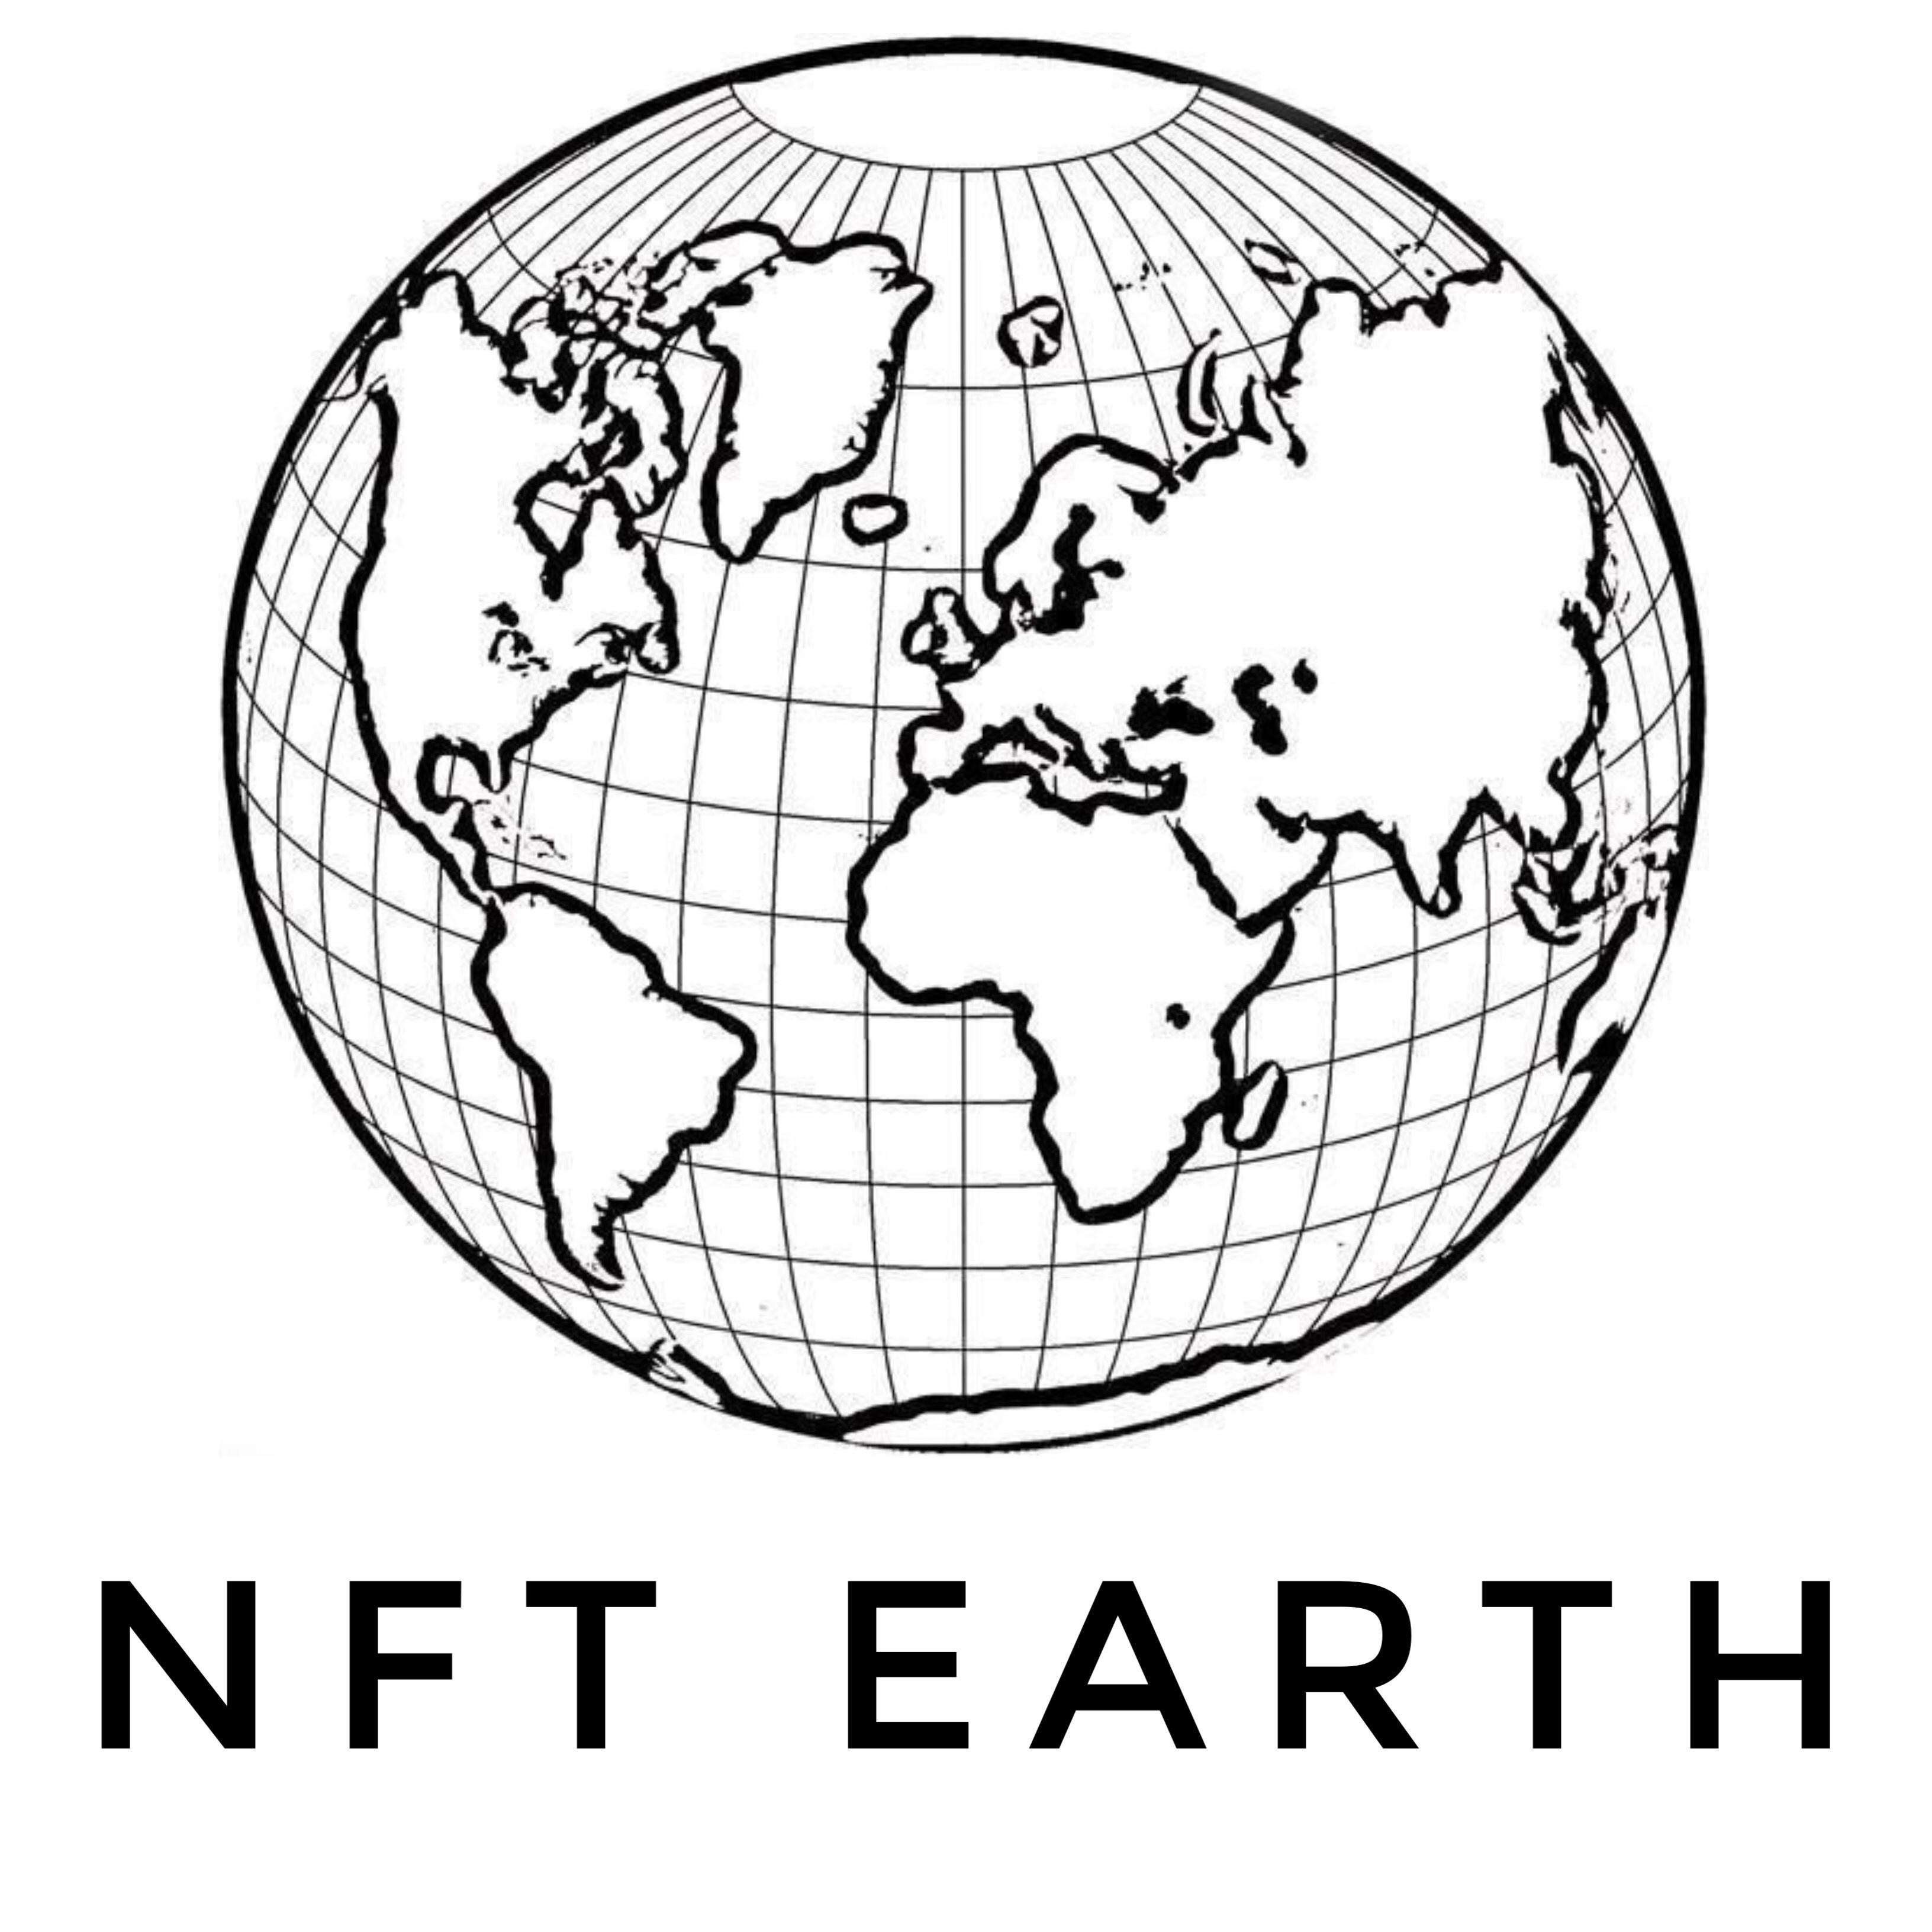 Alexey Egorov: The Russian entrepreneur issued the land through digital NFT